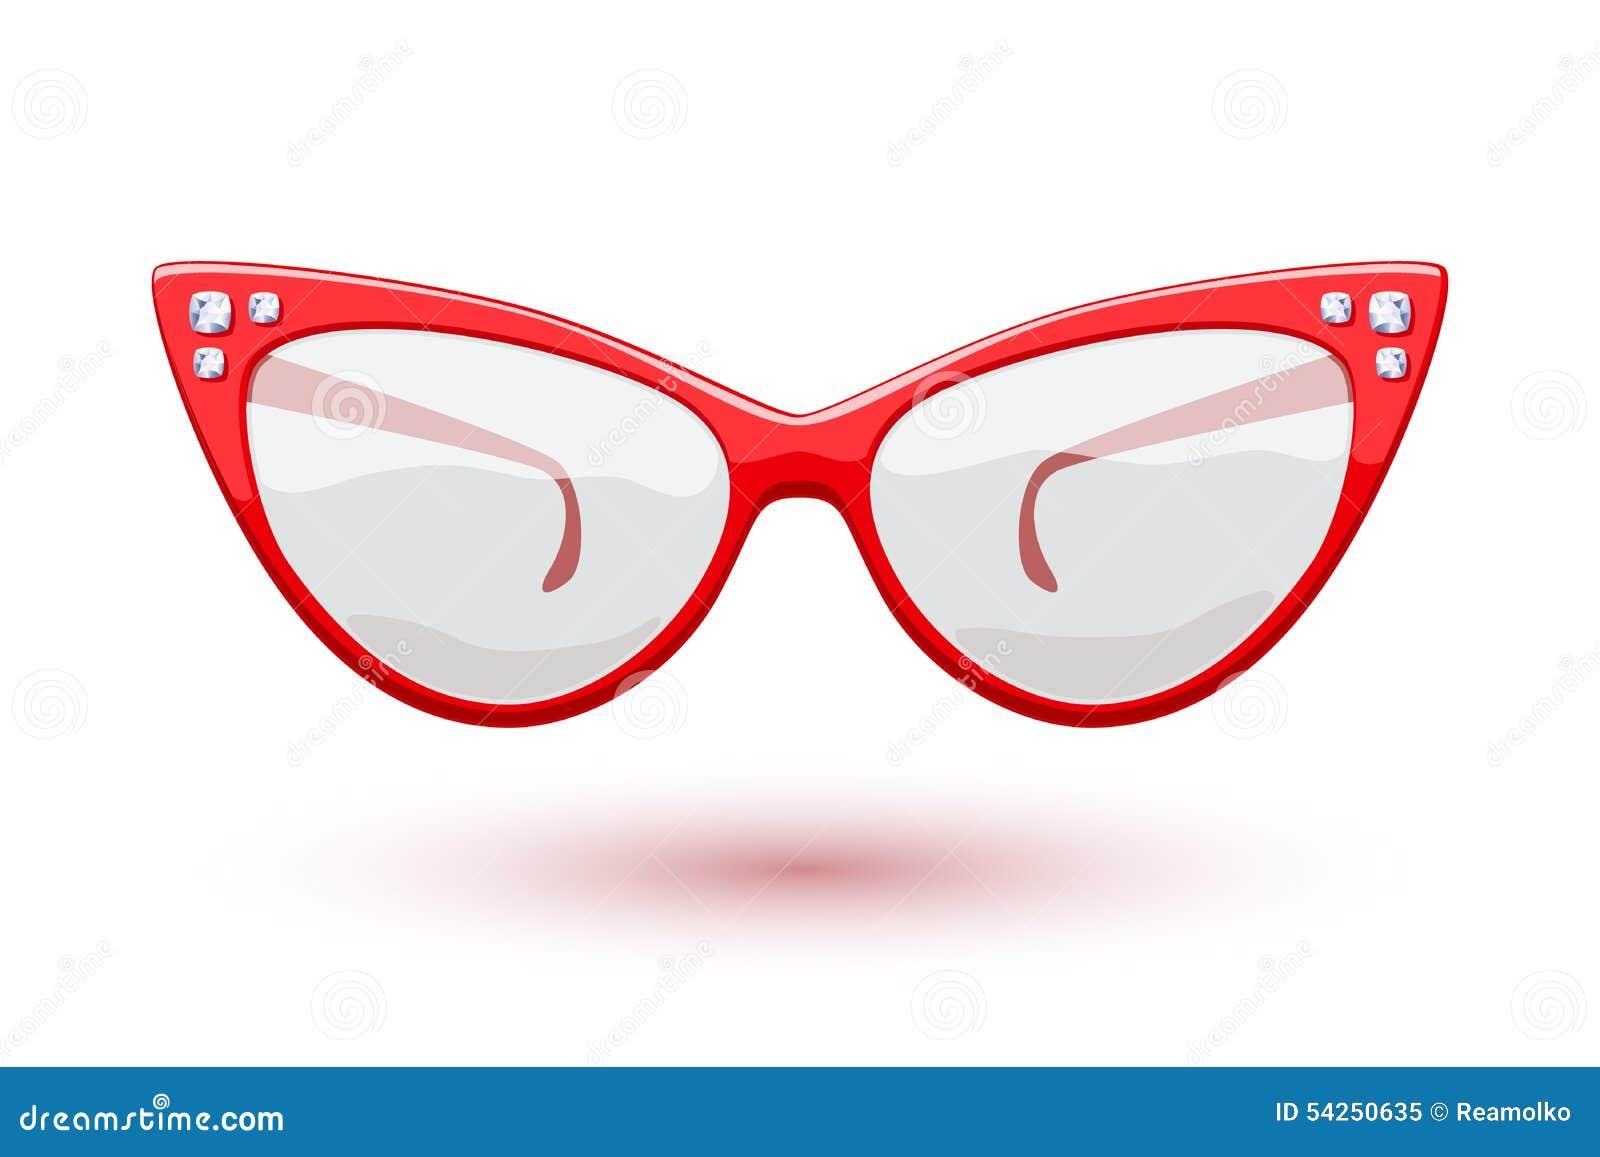 92c251e590 Cat eye red retro glasses with diamonds gemstones illustration. Eye wear  logo design.